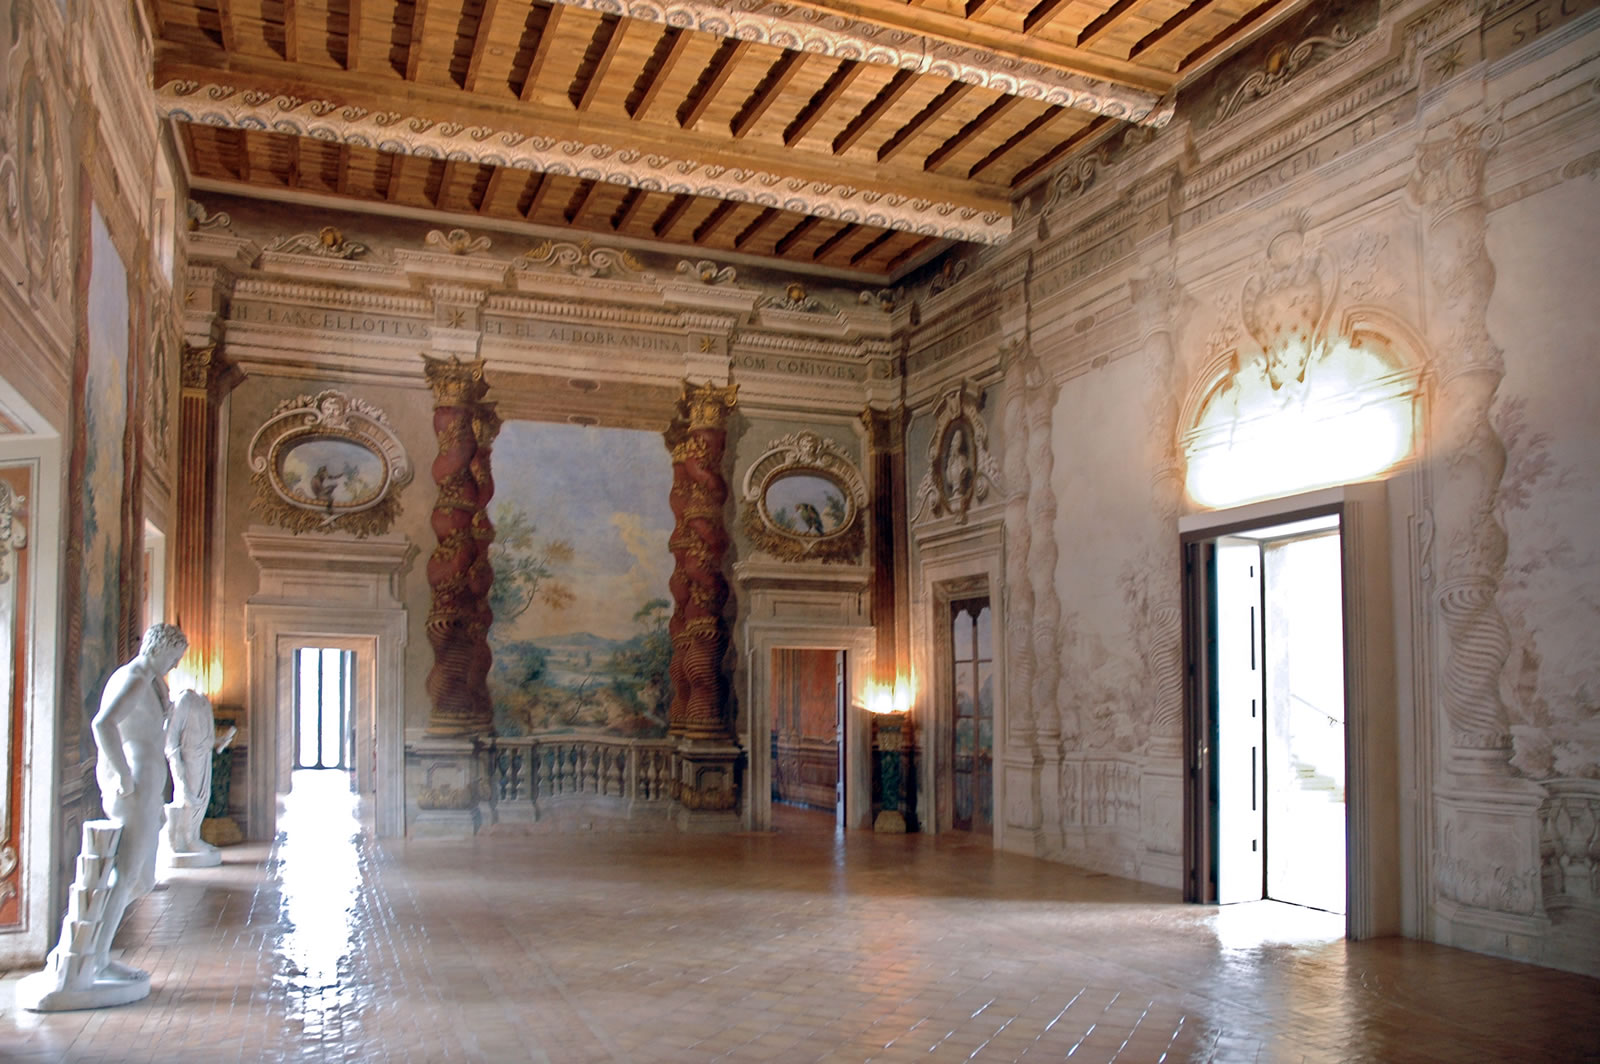 Villa Lancellotti, Salone